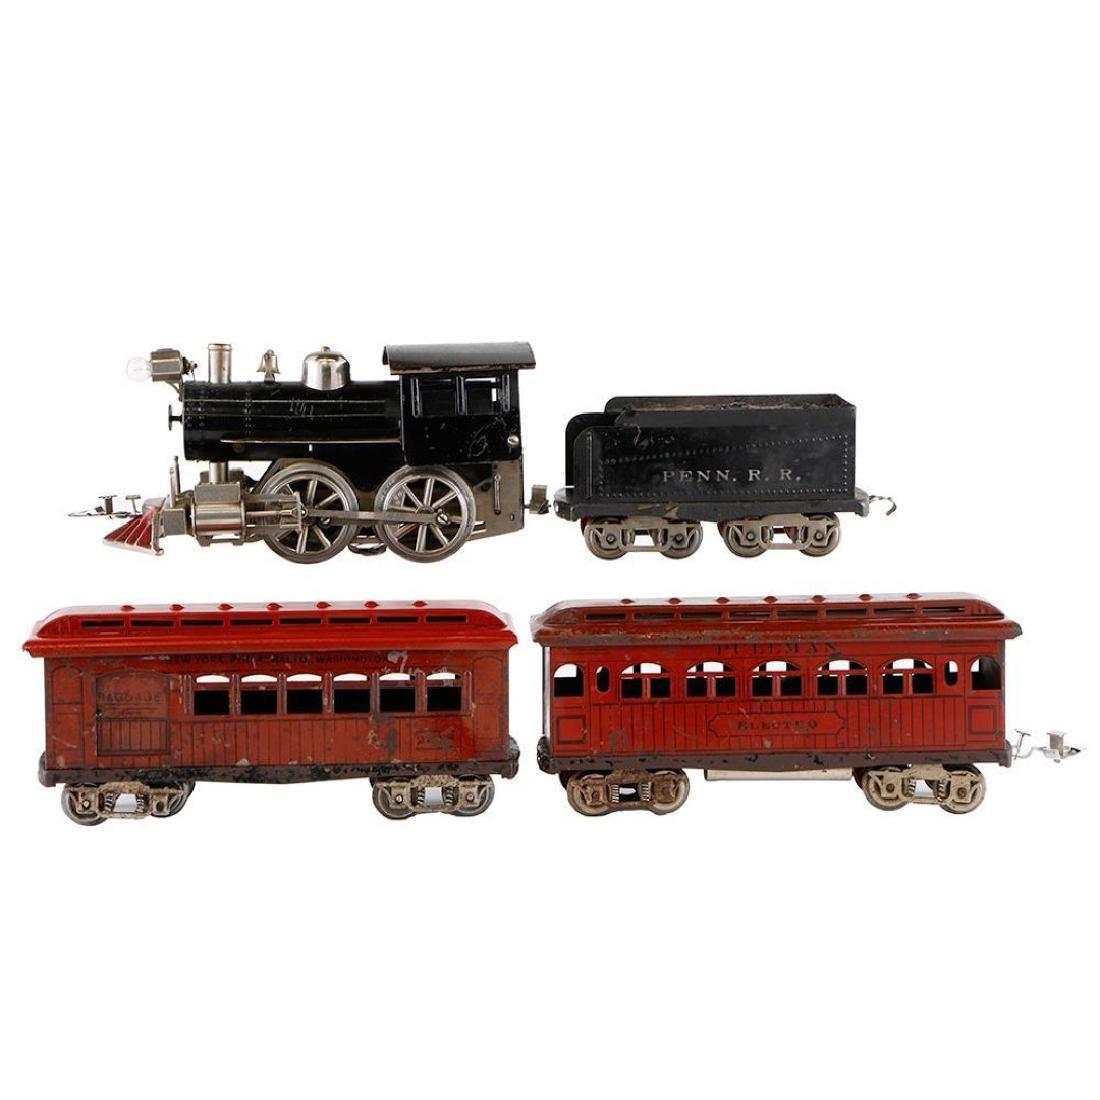 "Scarce Elektoy 2"" Gauge Steam Loco and Passenger Set"